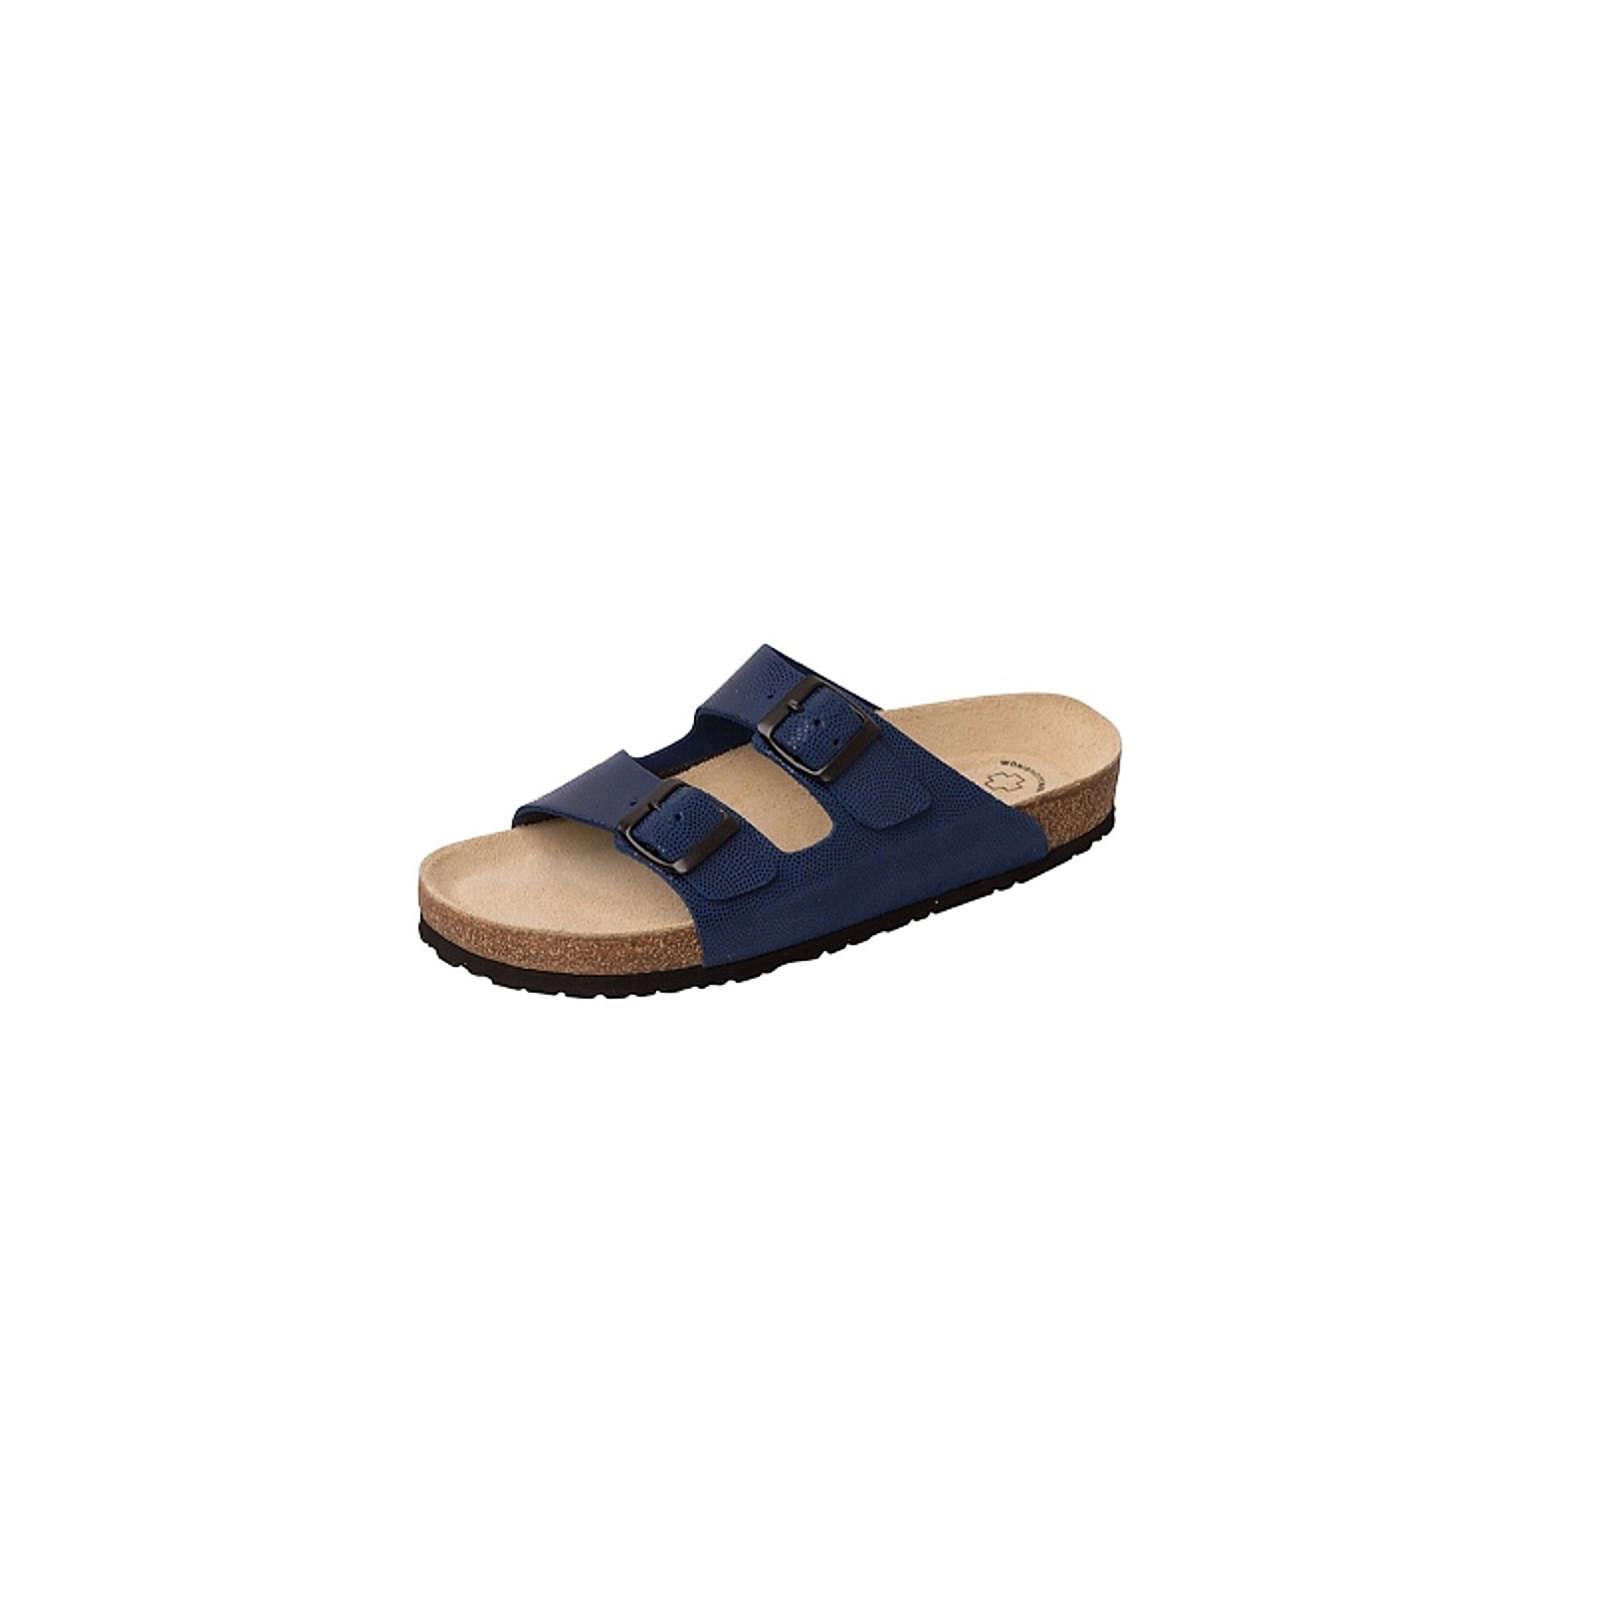 Weeger Komfort-Pantoletten dunkelblau Gr. 35